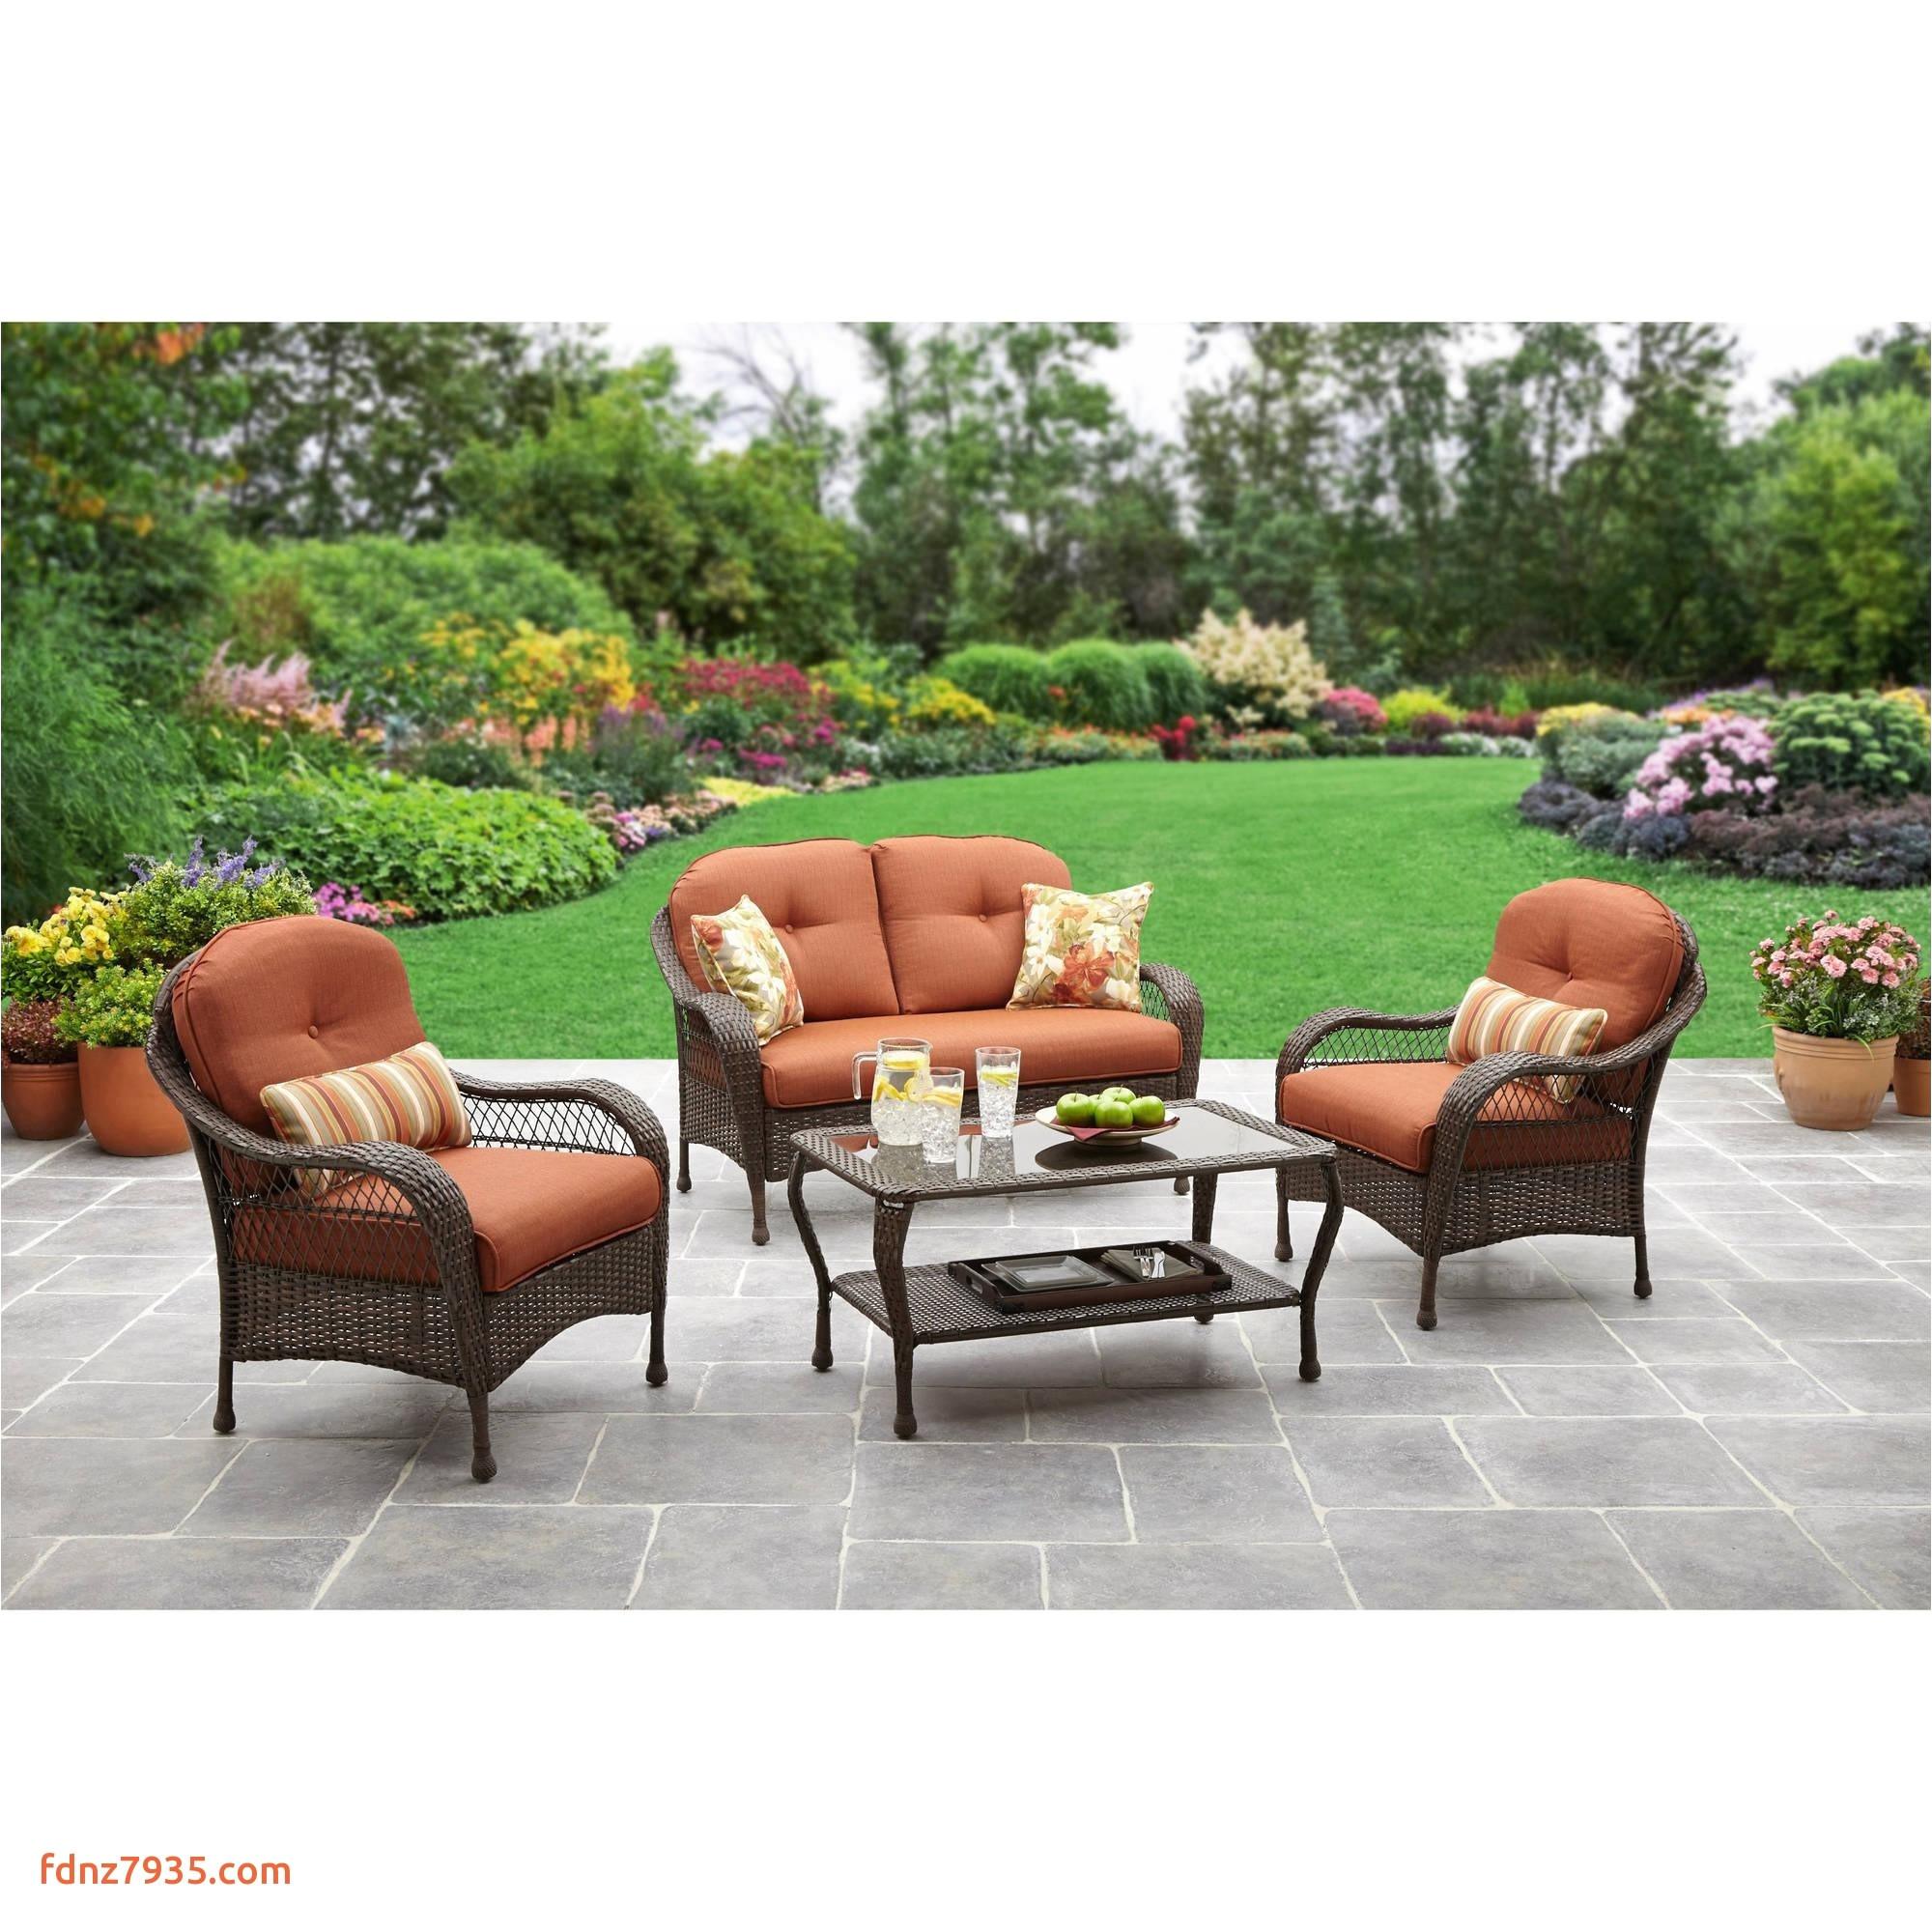 homecrest patio furniture unique better homes patio set best metal patio tableca round outdoor